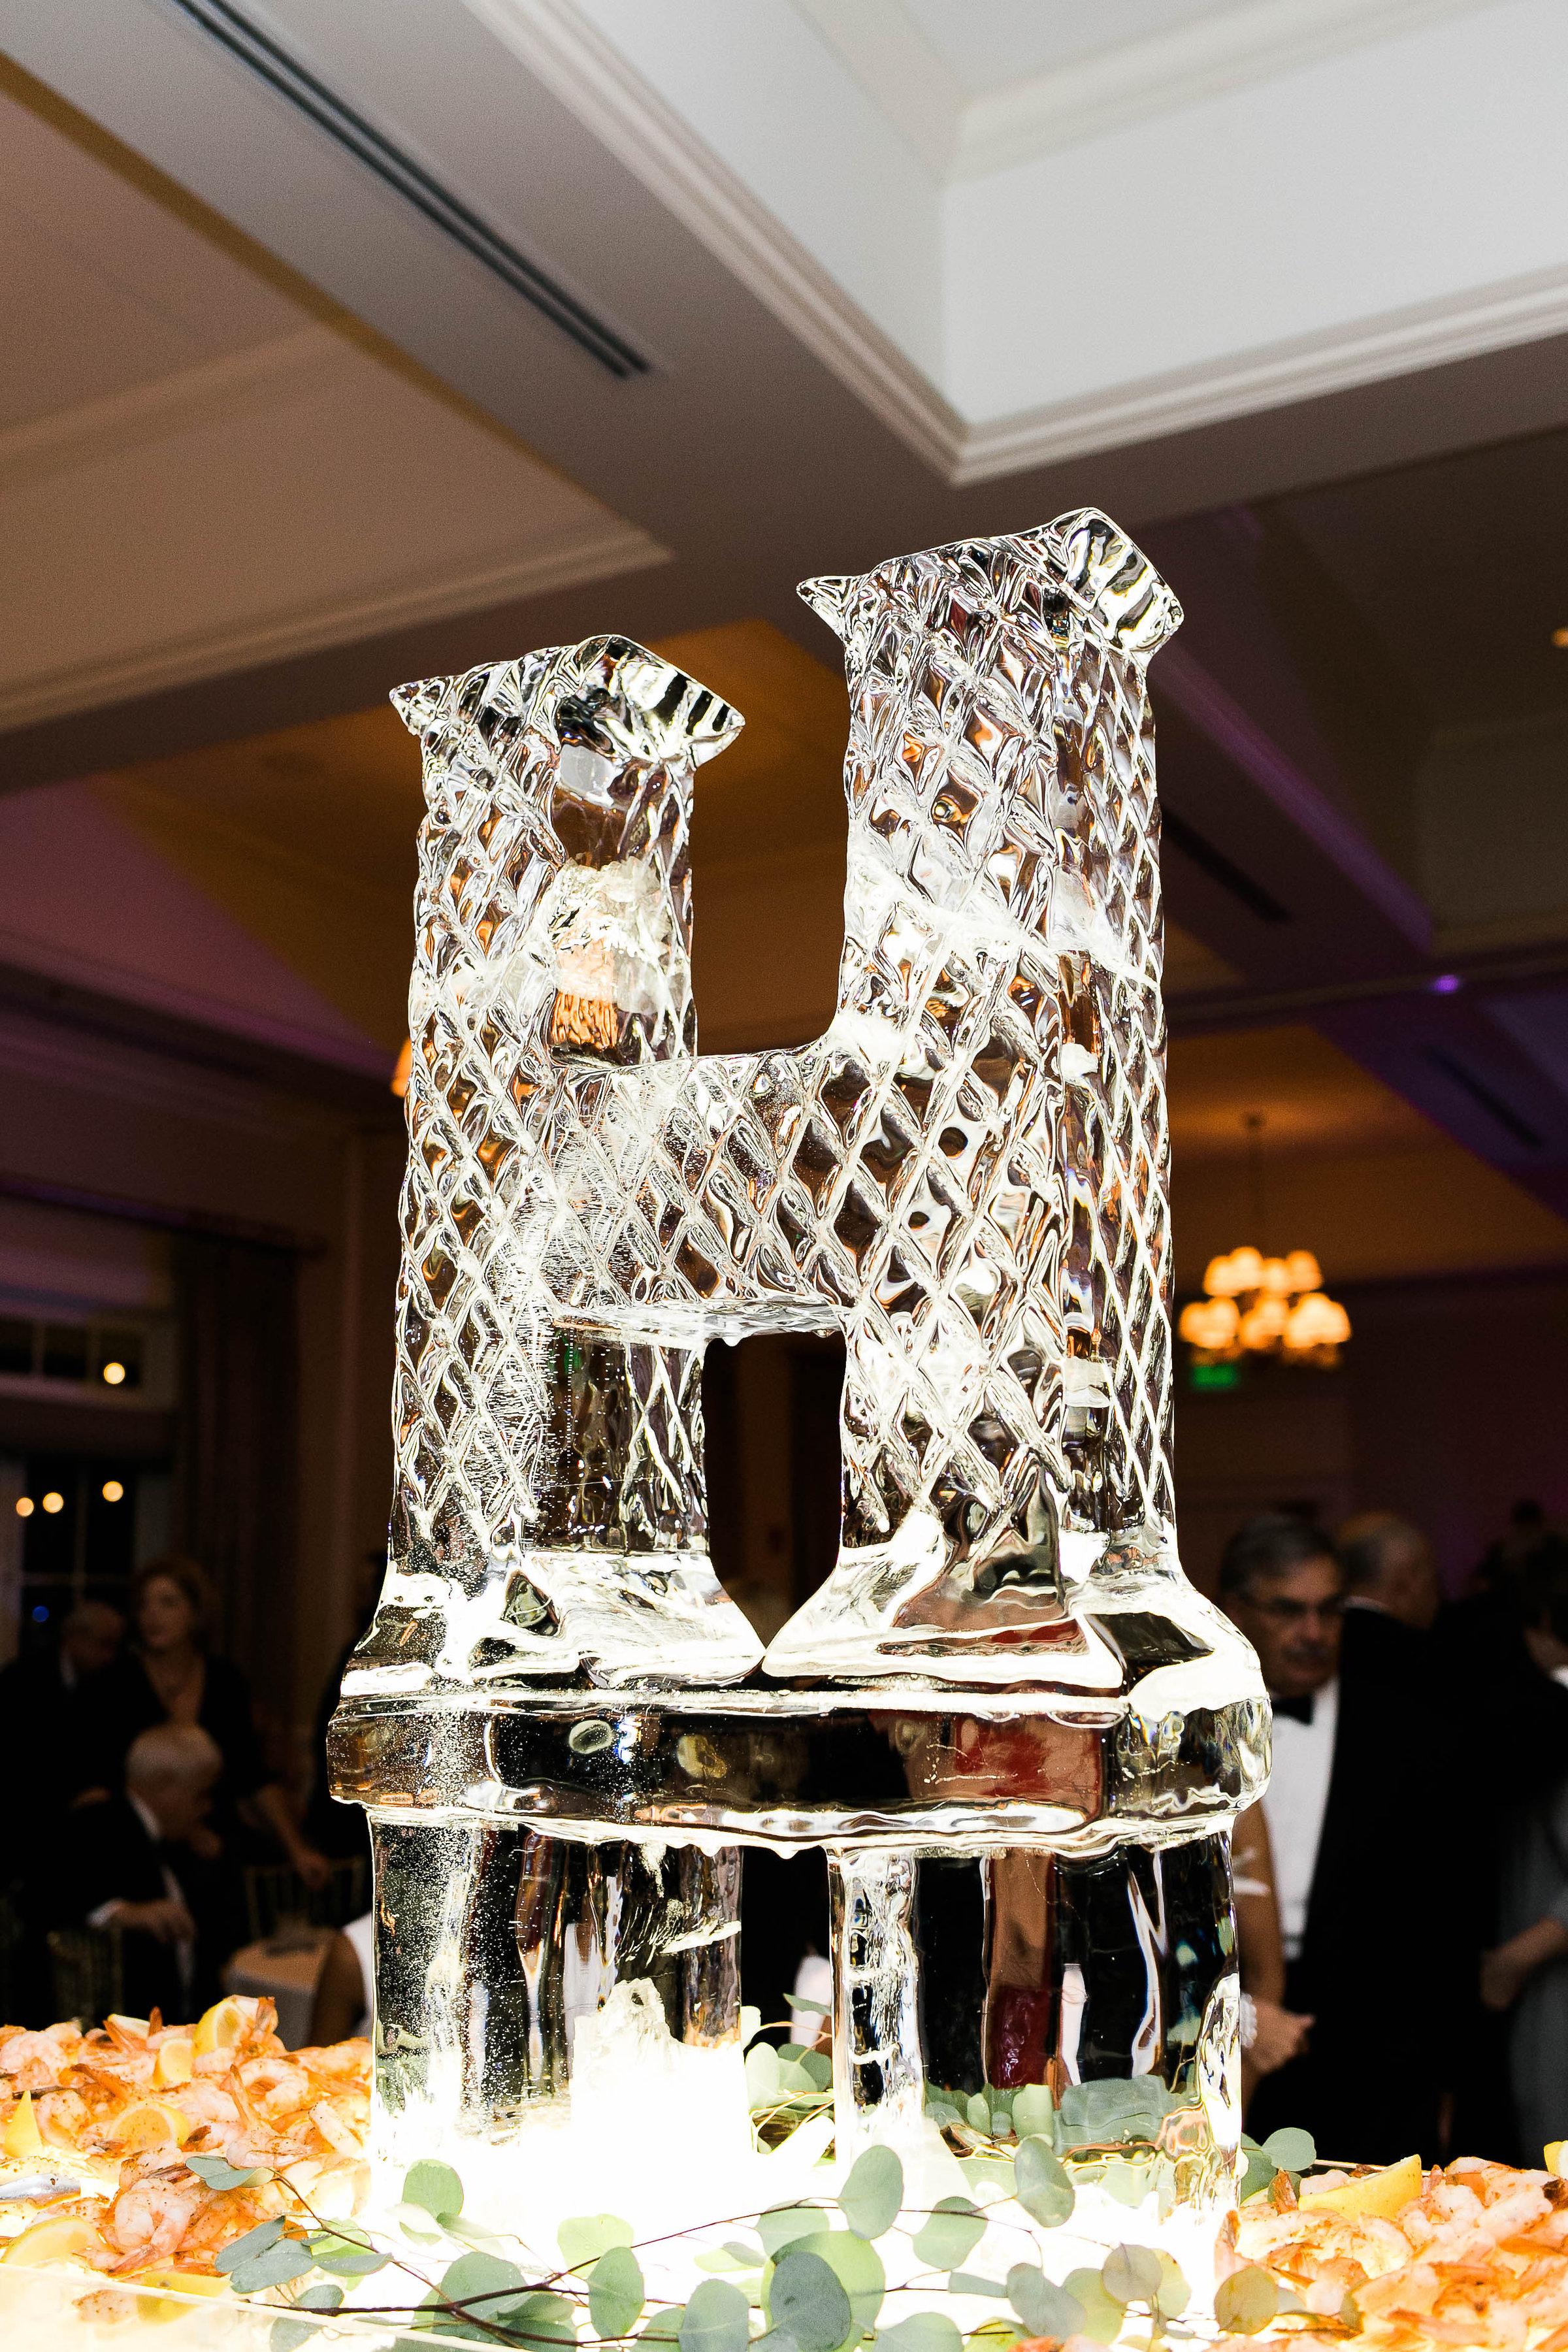 Ice sculpture at Savannah Golf Club wedding